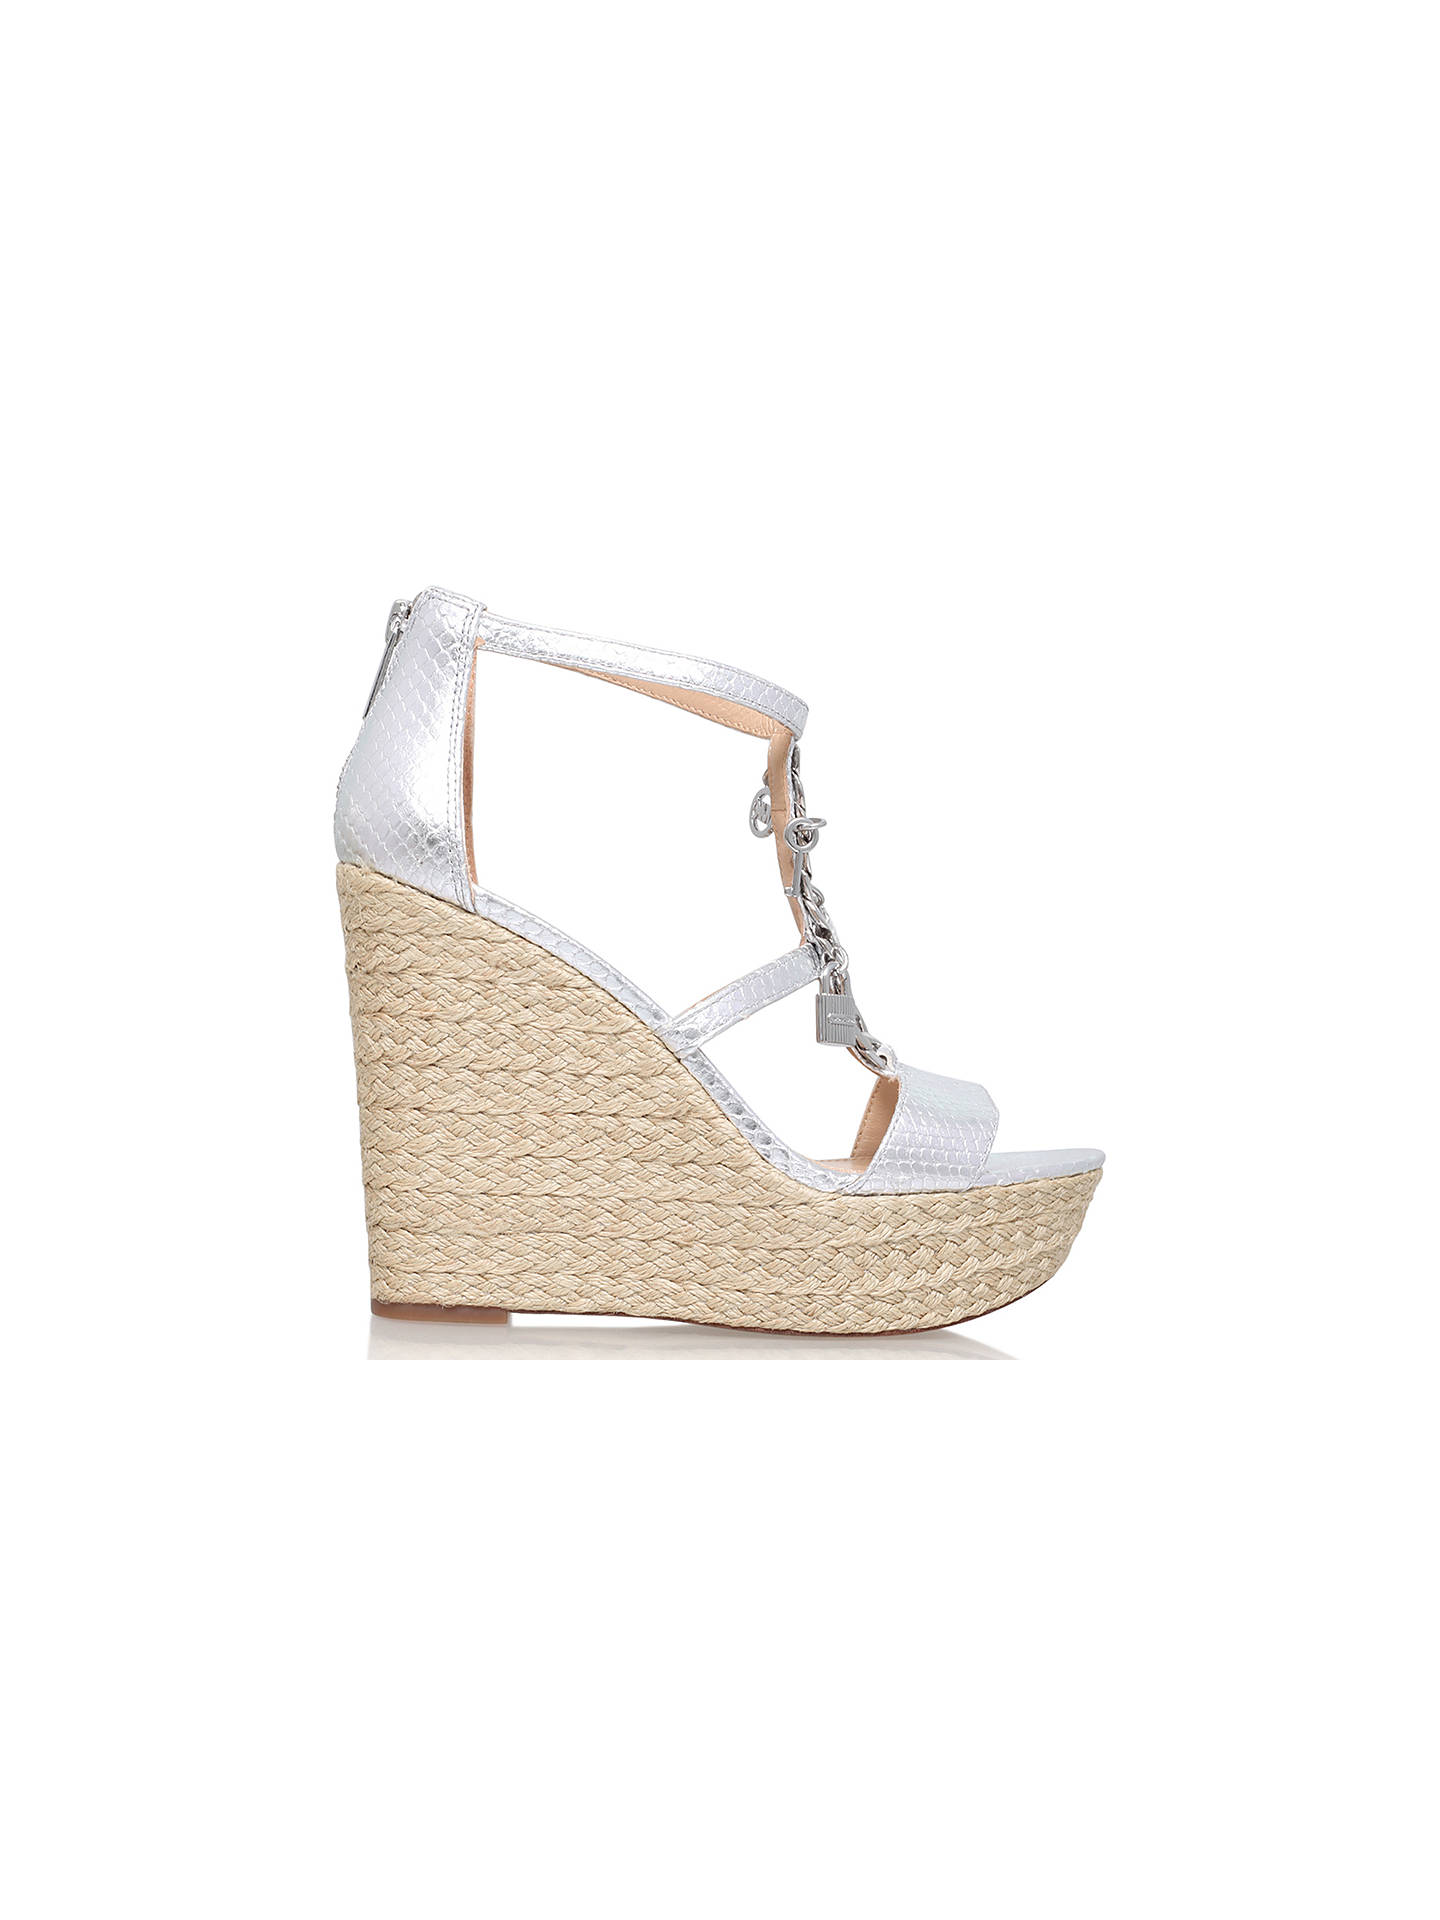 49daf52e3ea05 Buy MICHAEL Michael Kors Suki Wedge Heeled Sandals